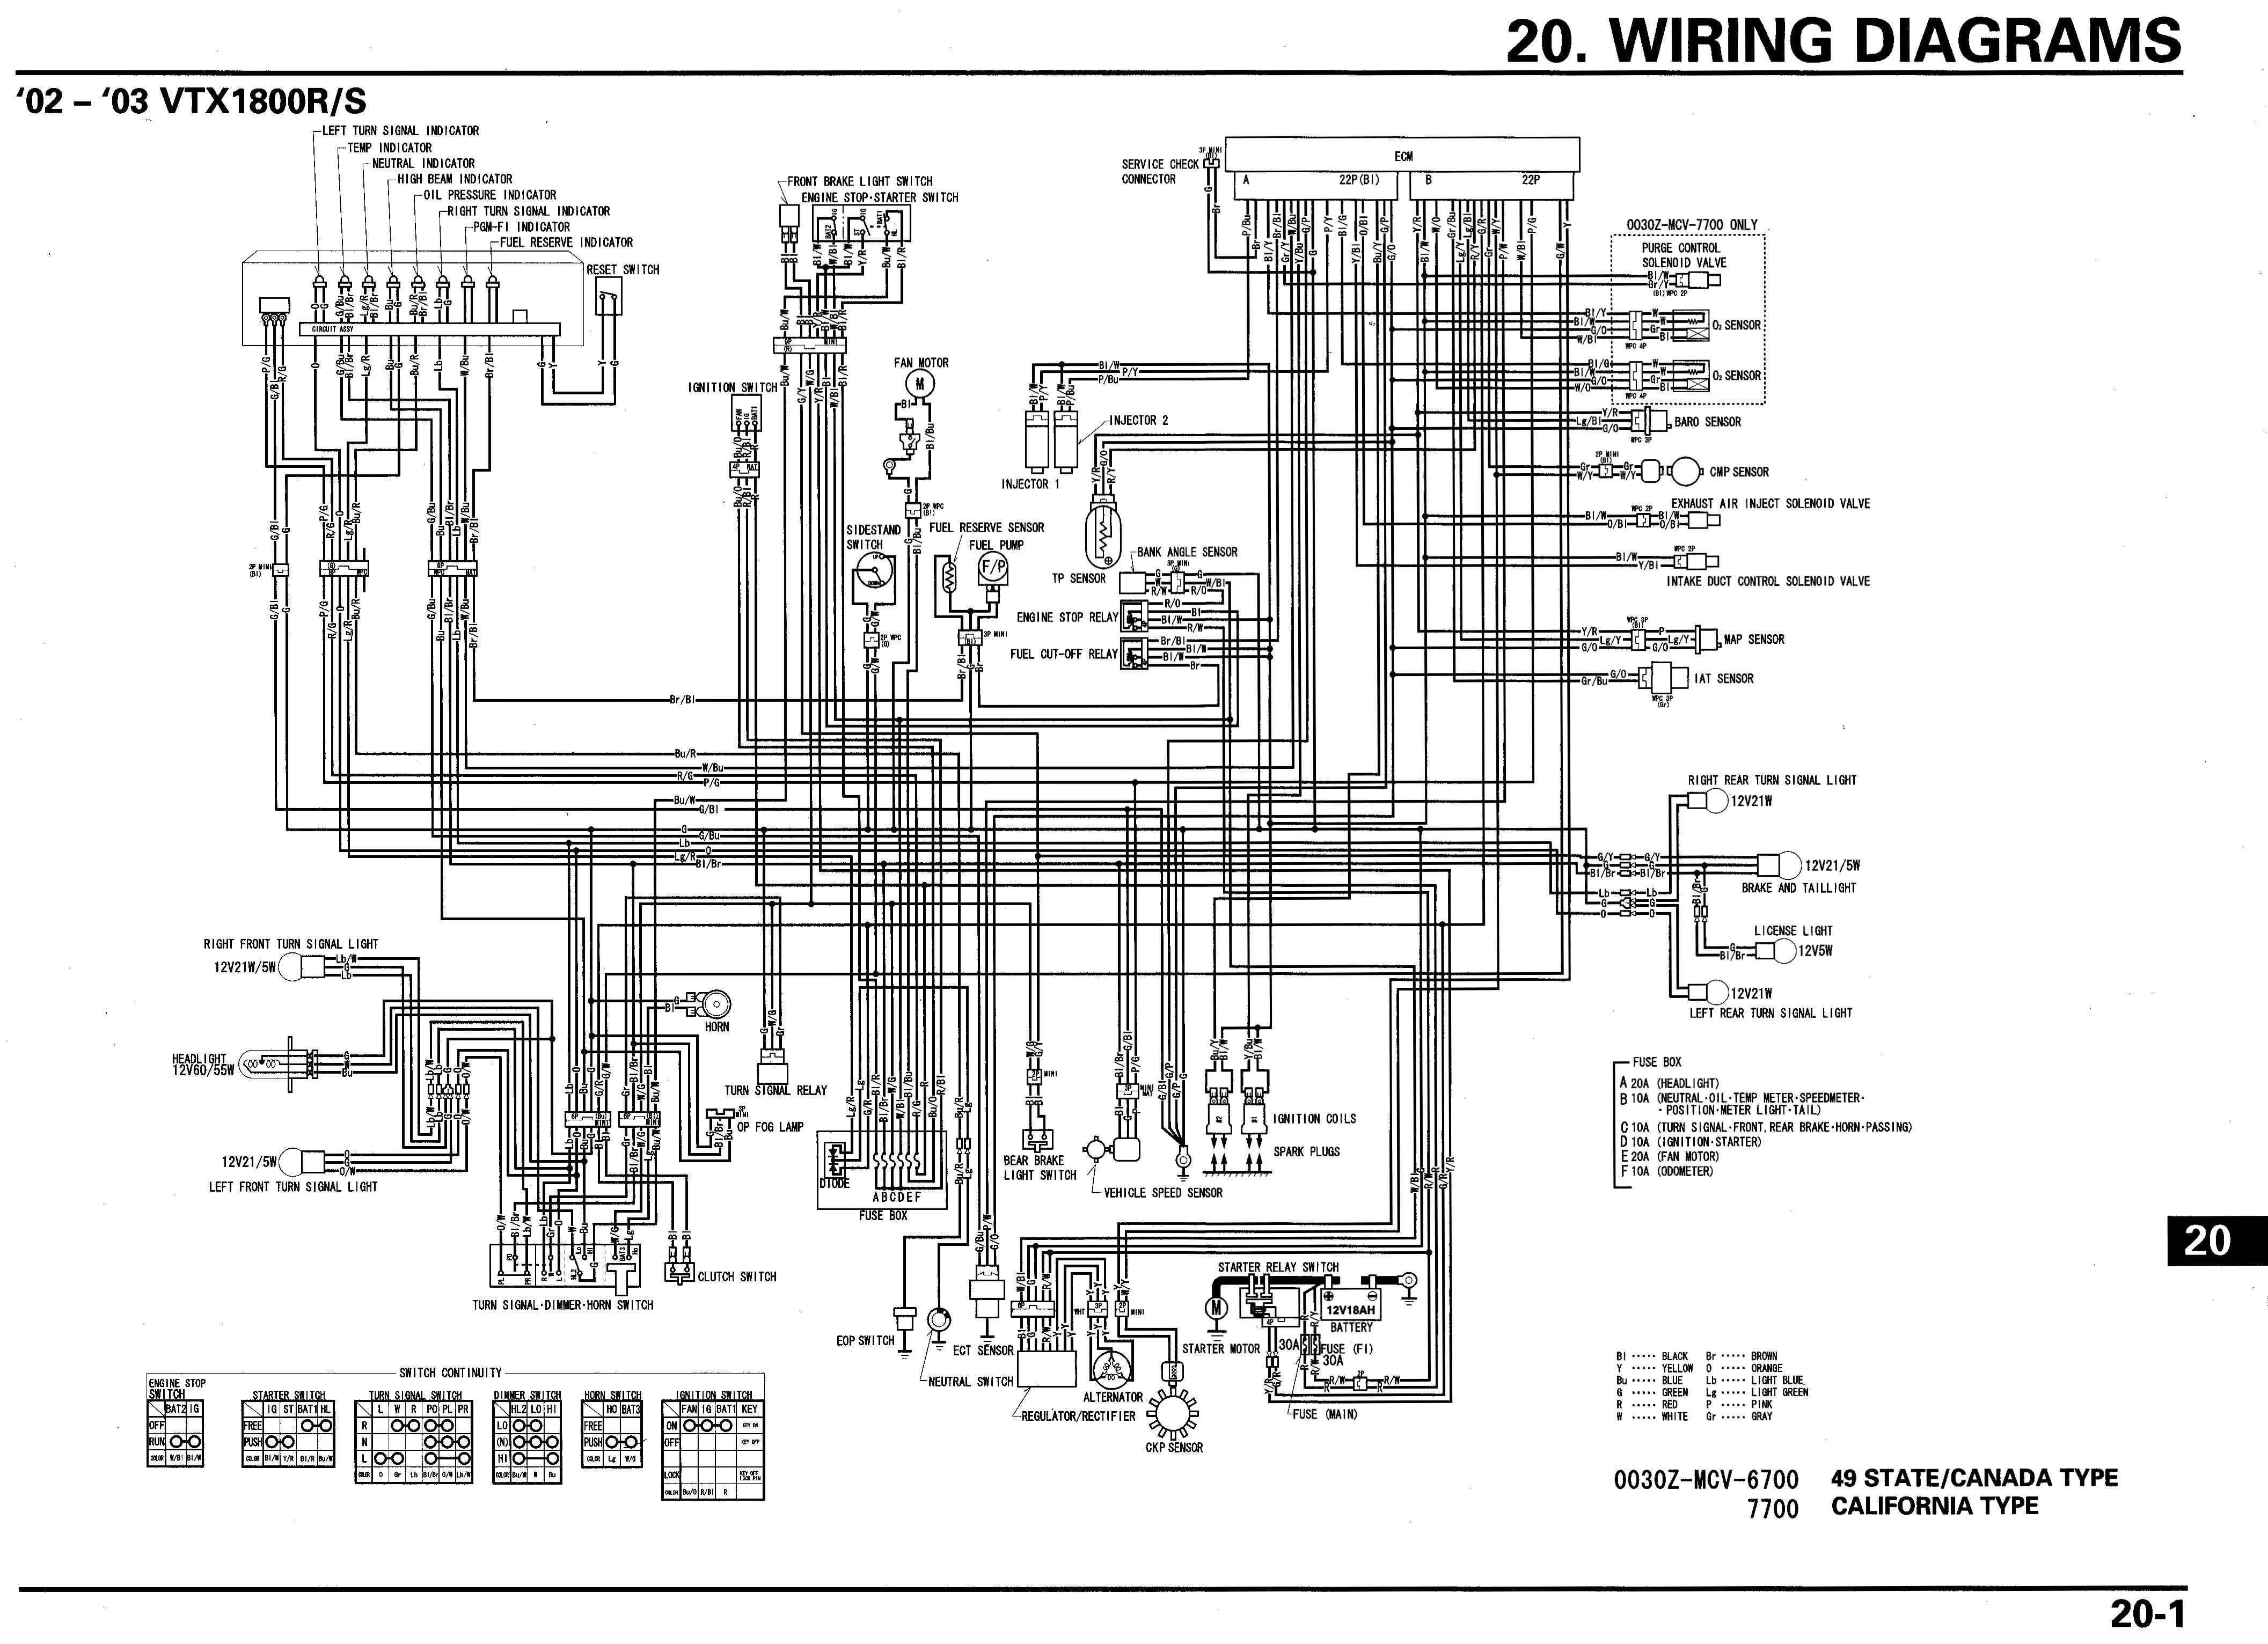 honda vtx 1800 c wiring diagram image 2